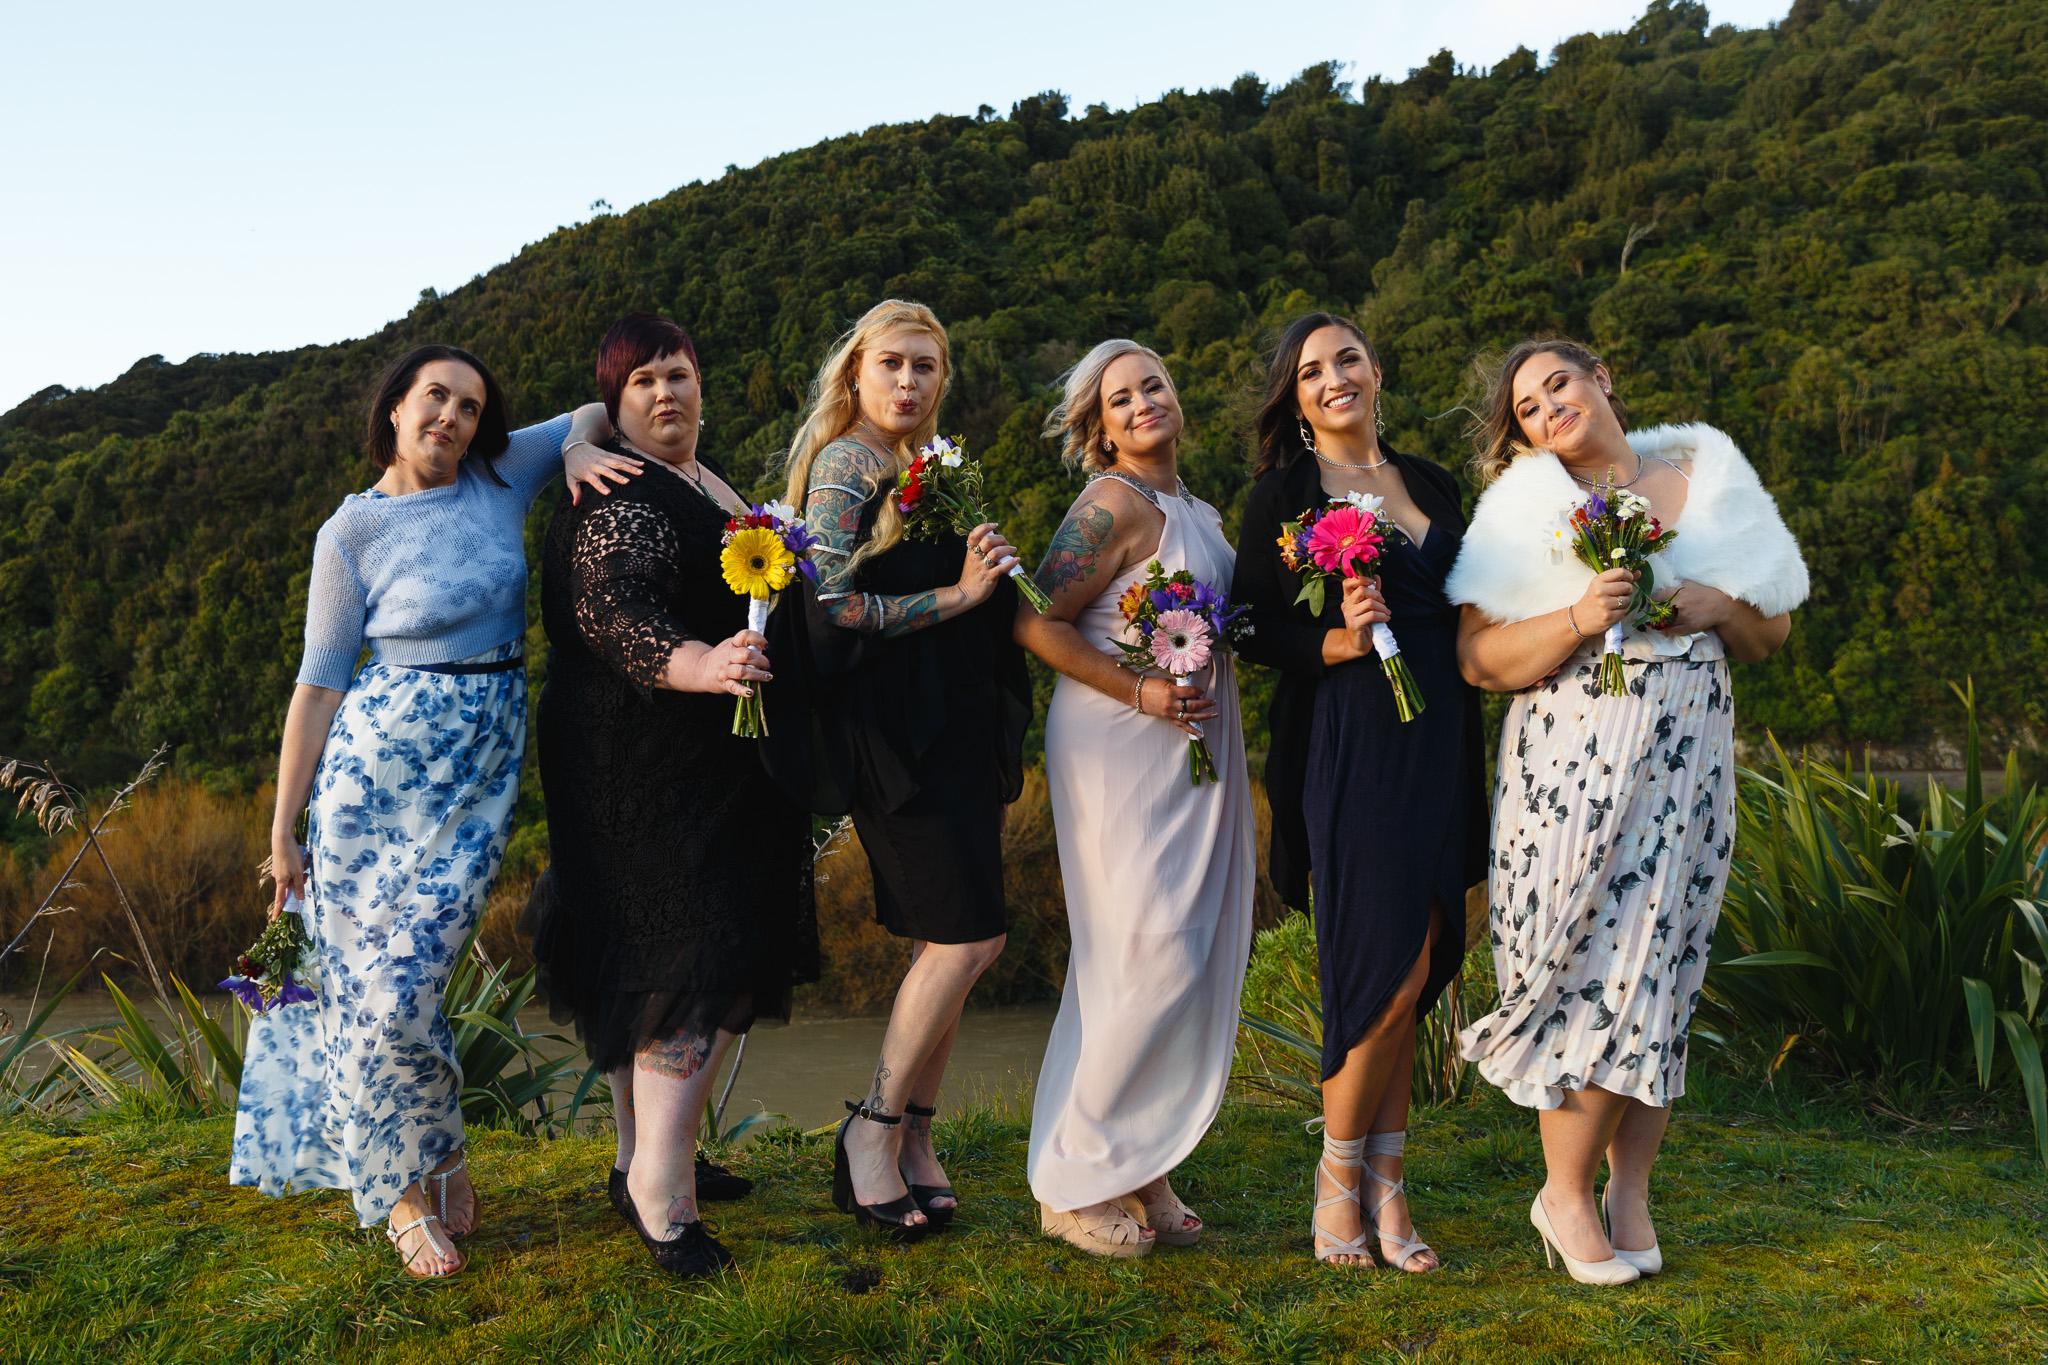 palmerston-north-wedding-photography-highlight-new-zealand.jpg-483.jpg